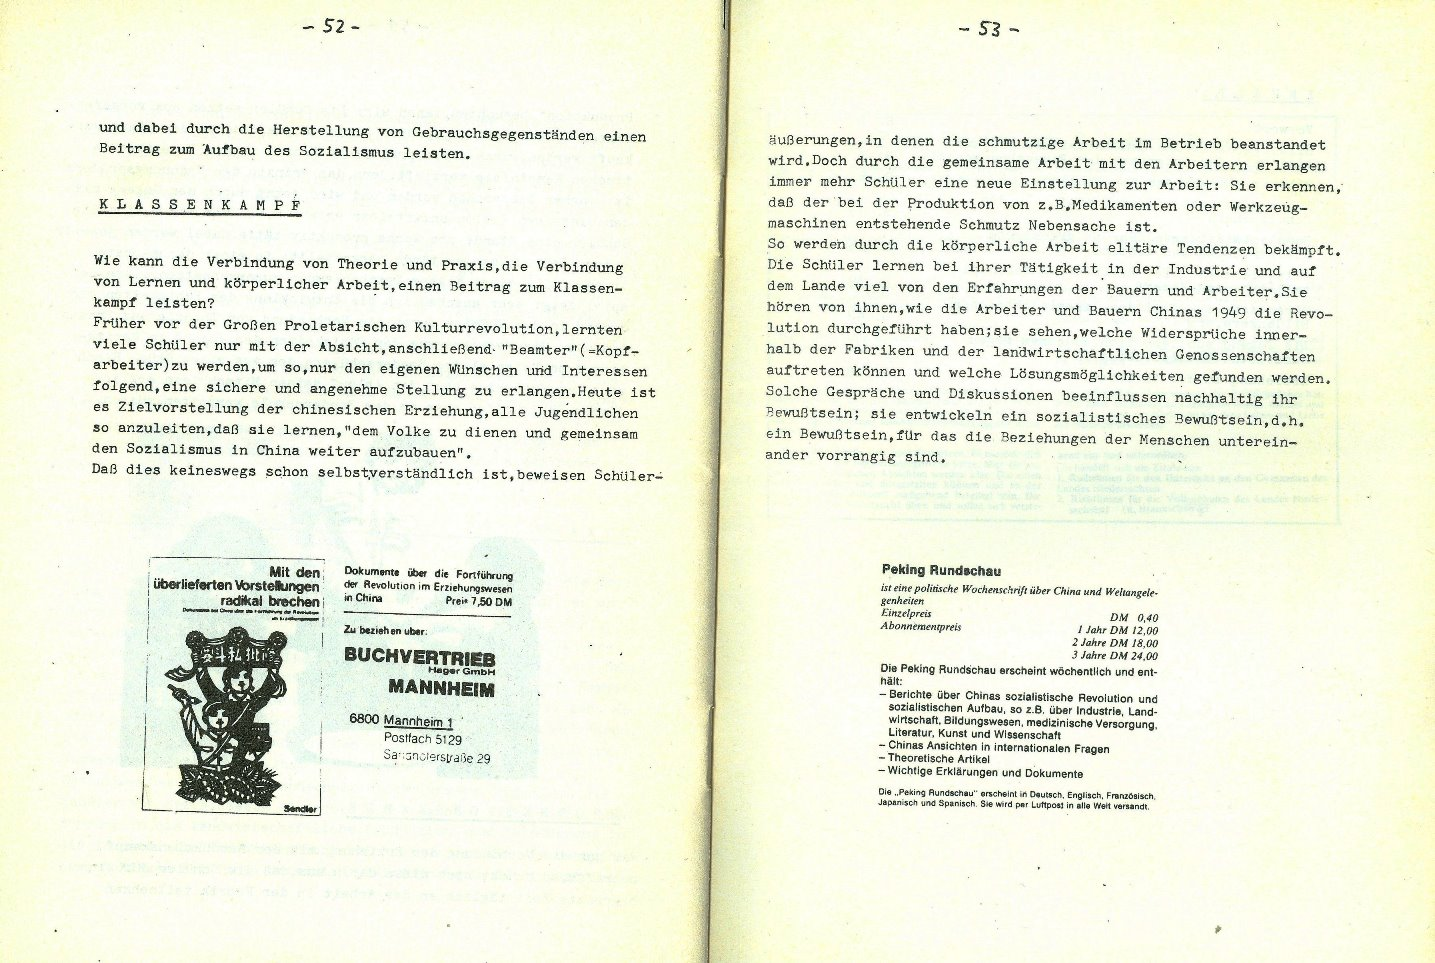 Hannover_GUV_Schulwesen031